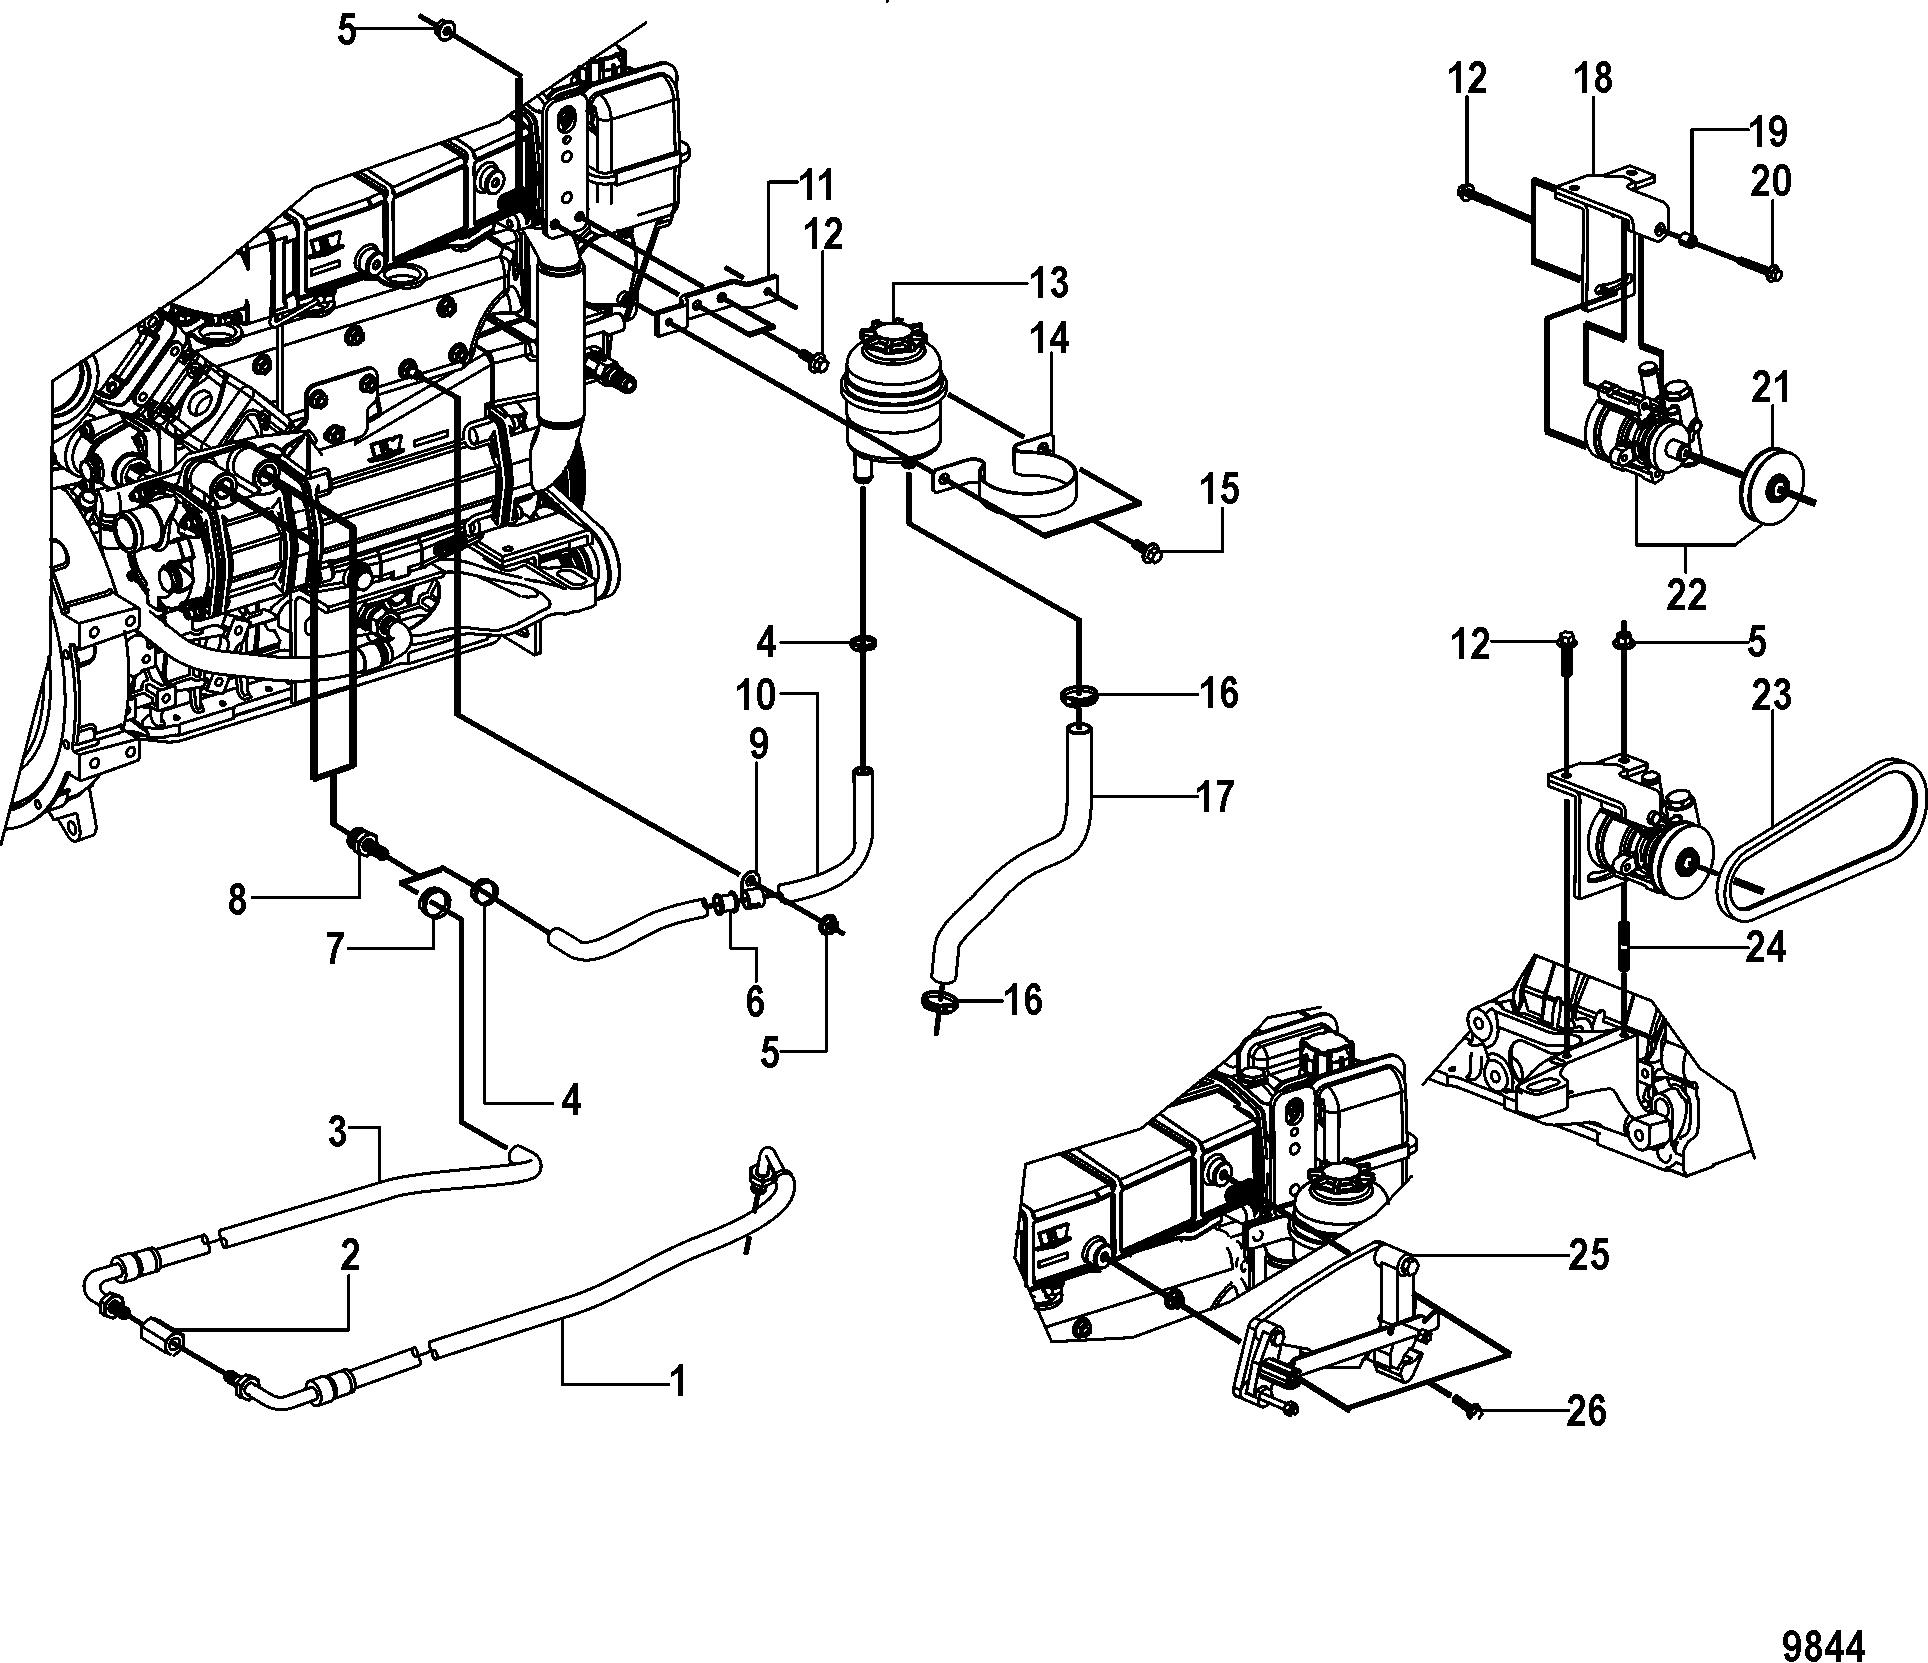 2006 Mercruiser 4 3 Service Manual